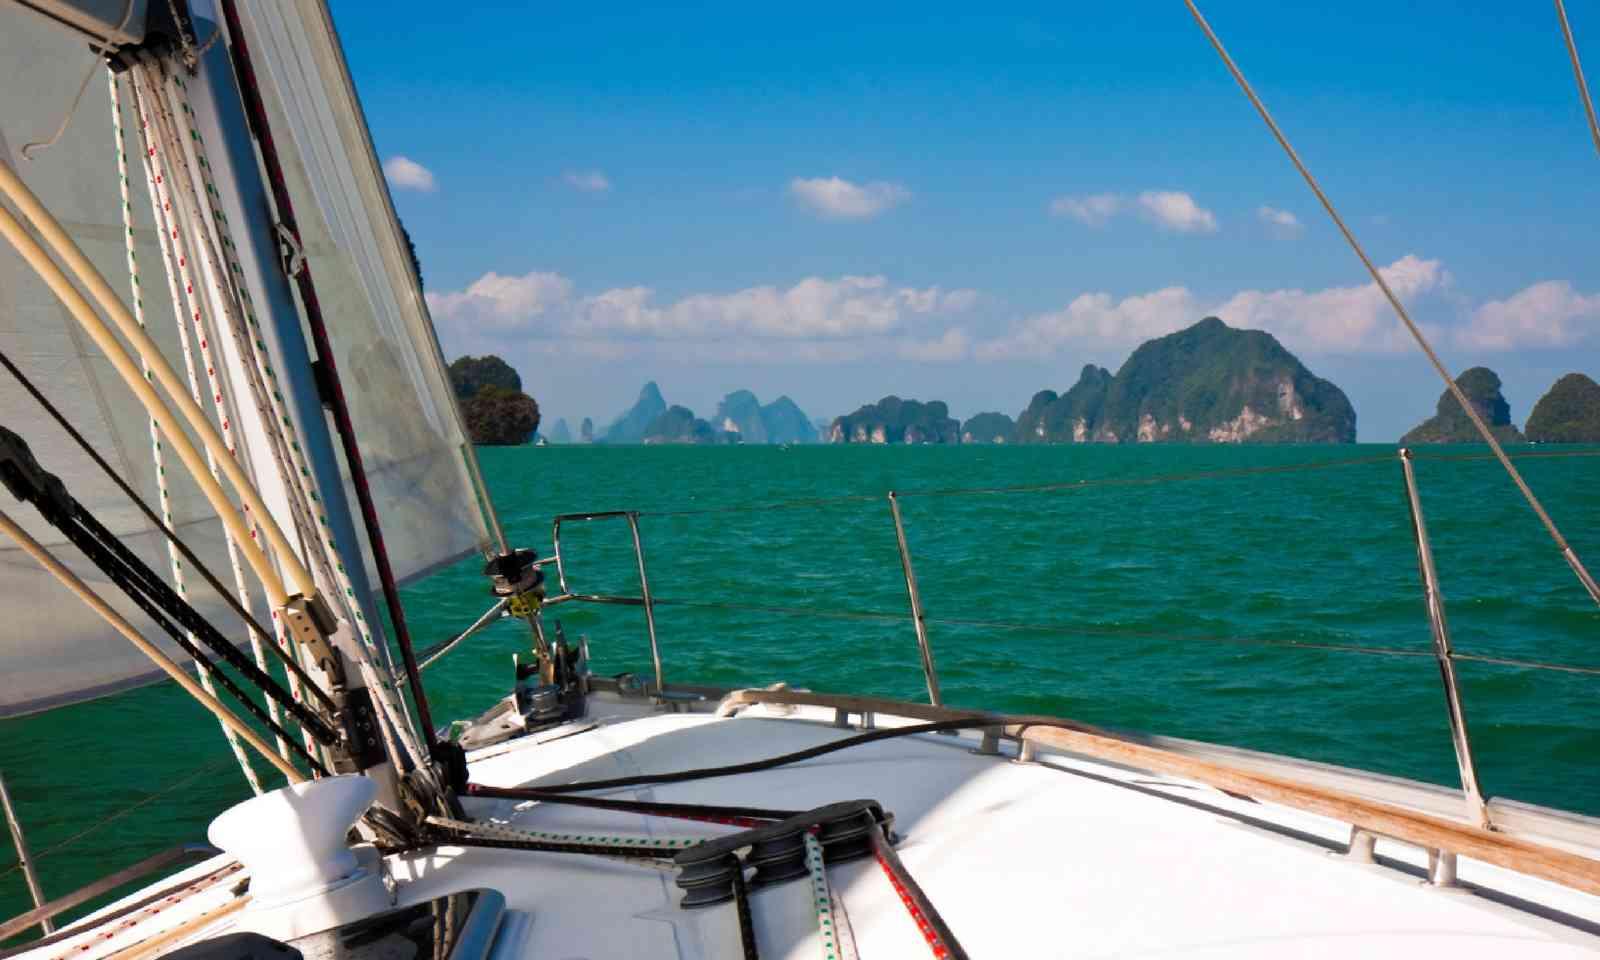 Sailboat heading towards Phang-Nga Bay in Thailand (Shutterstock)